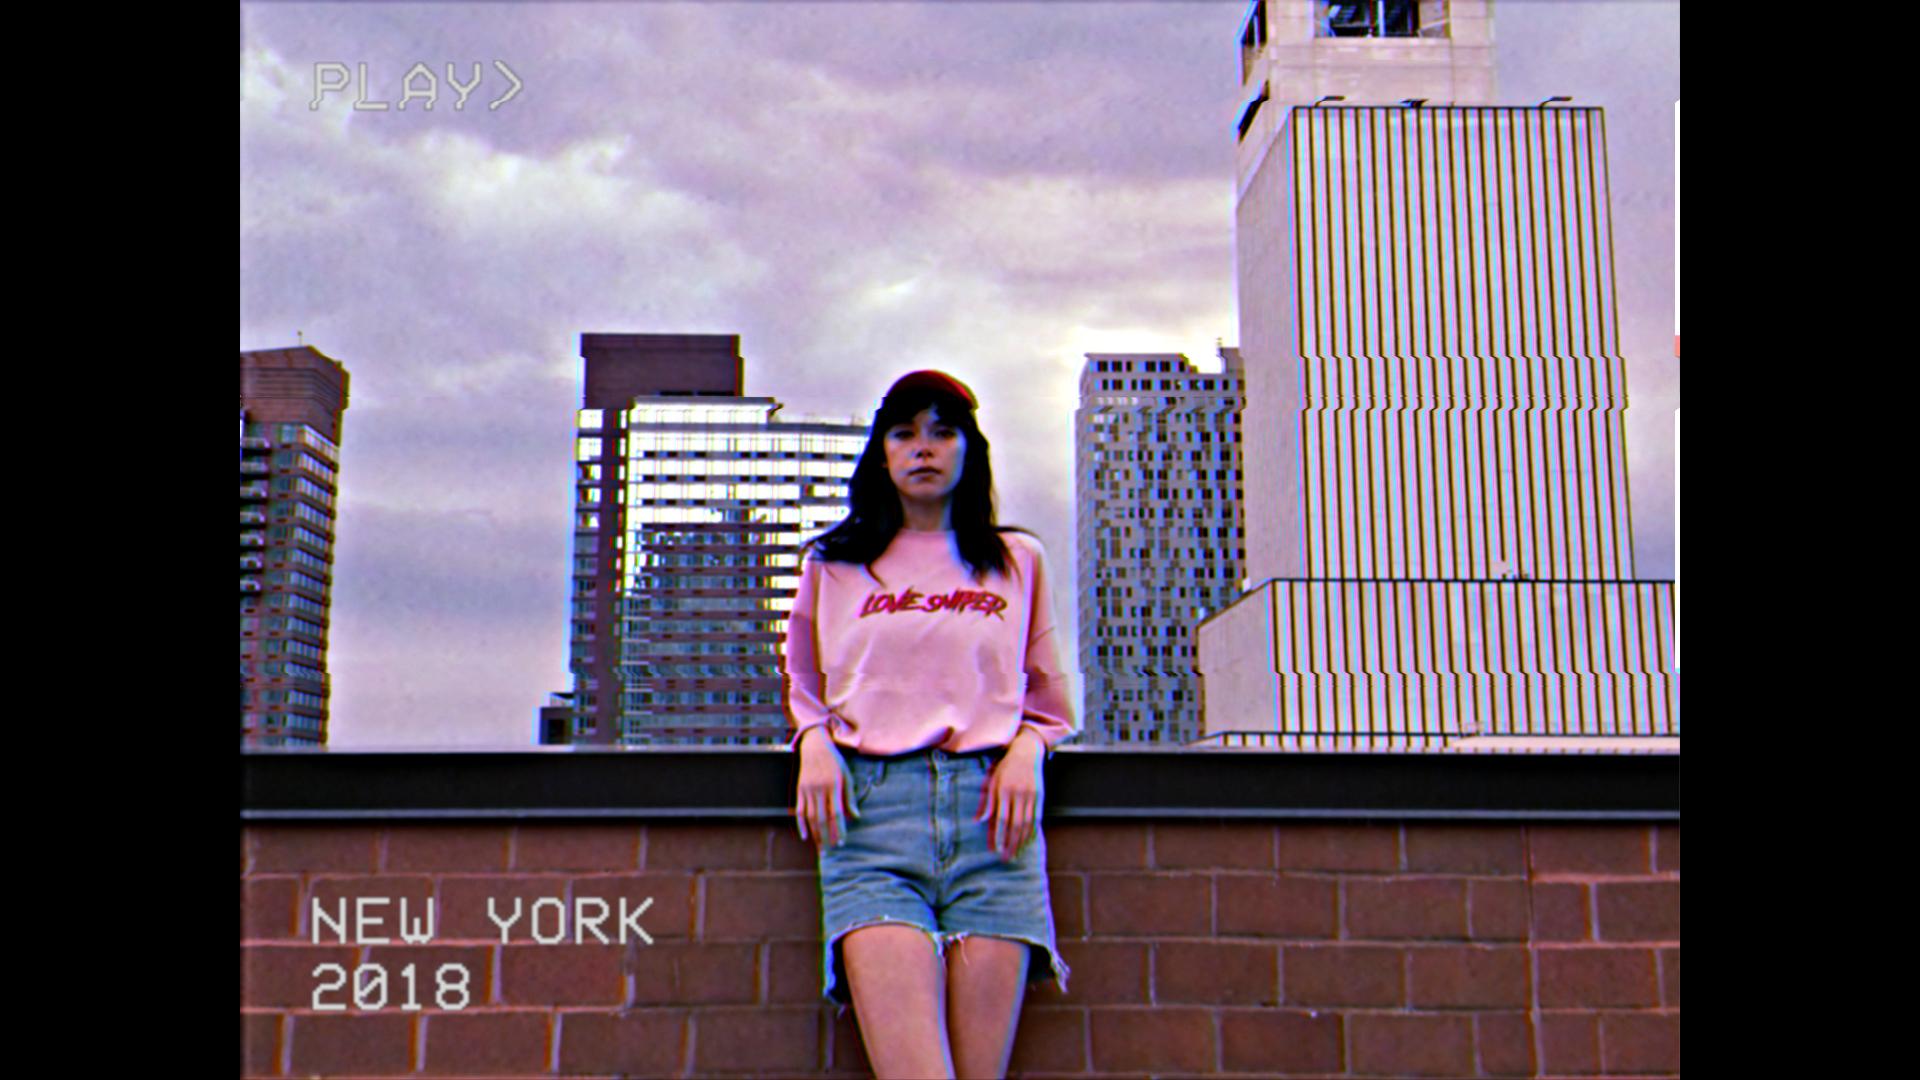 Lipunderpoint X VIP.COM   New 2018 Spring/Summer Lookbook in New York.  Cinematographer